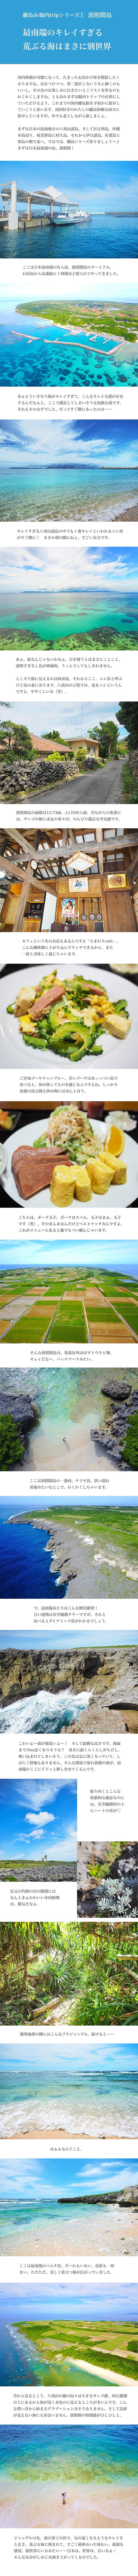 tomako200624.jpg